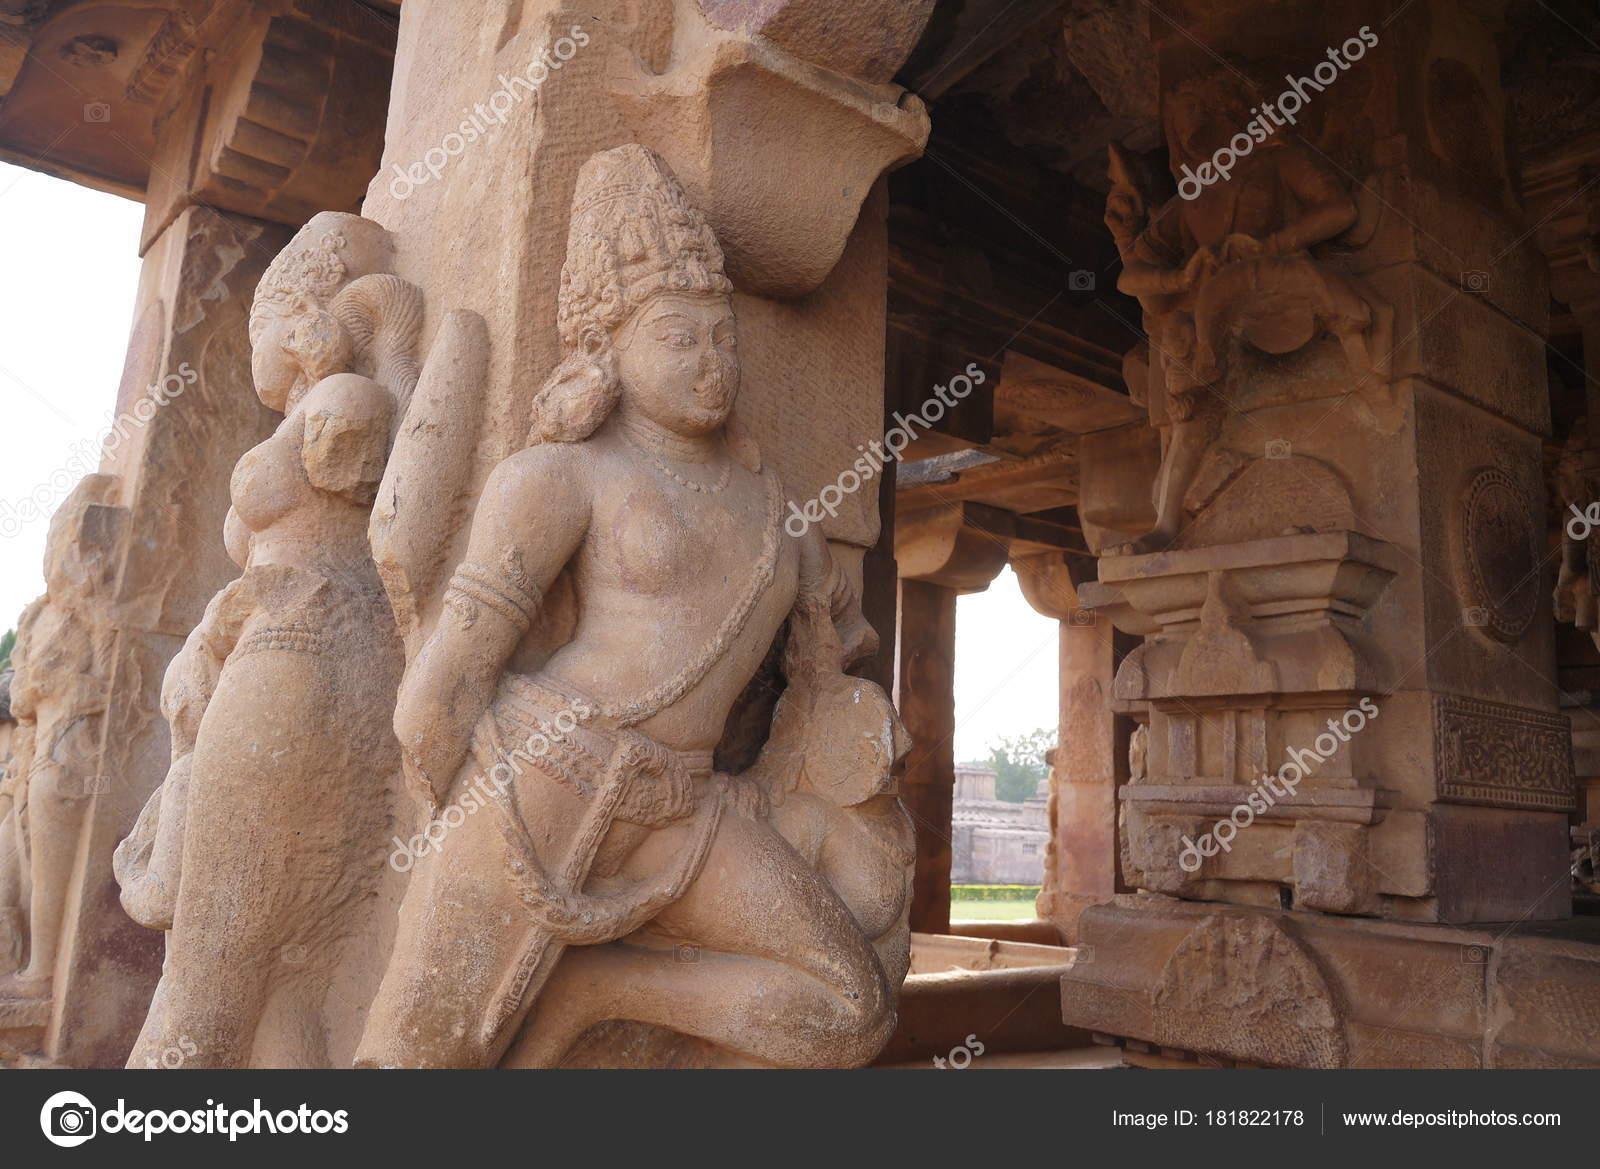 Statues Decorating Columns Ancient Temple City Aykhole India ...